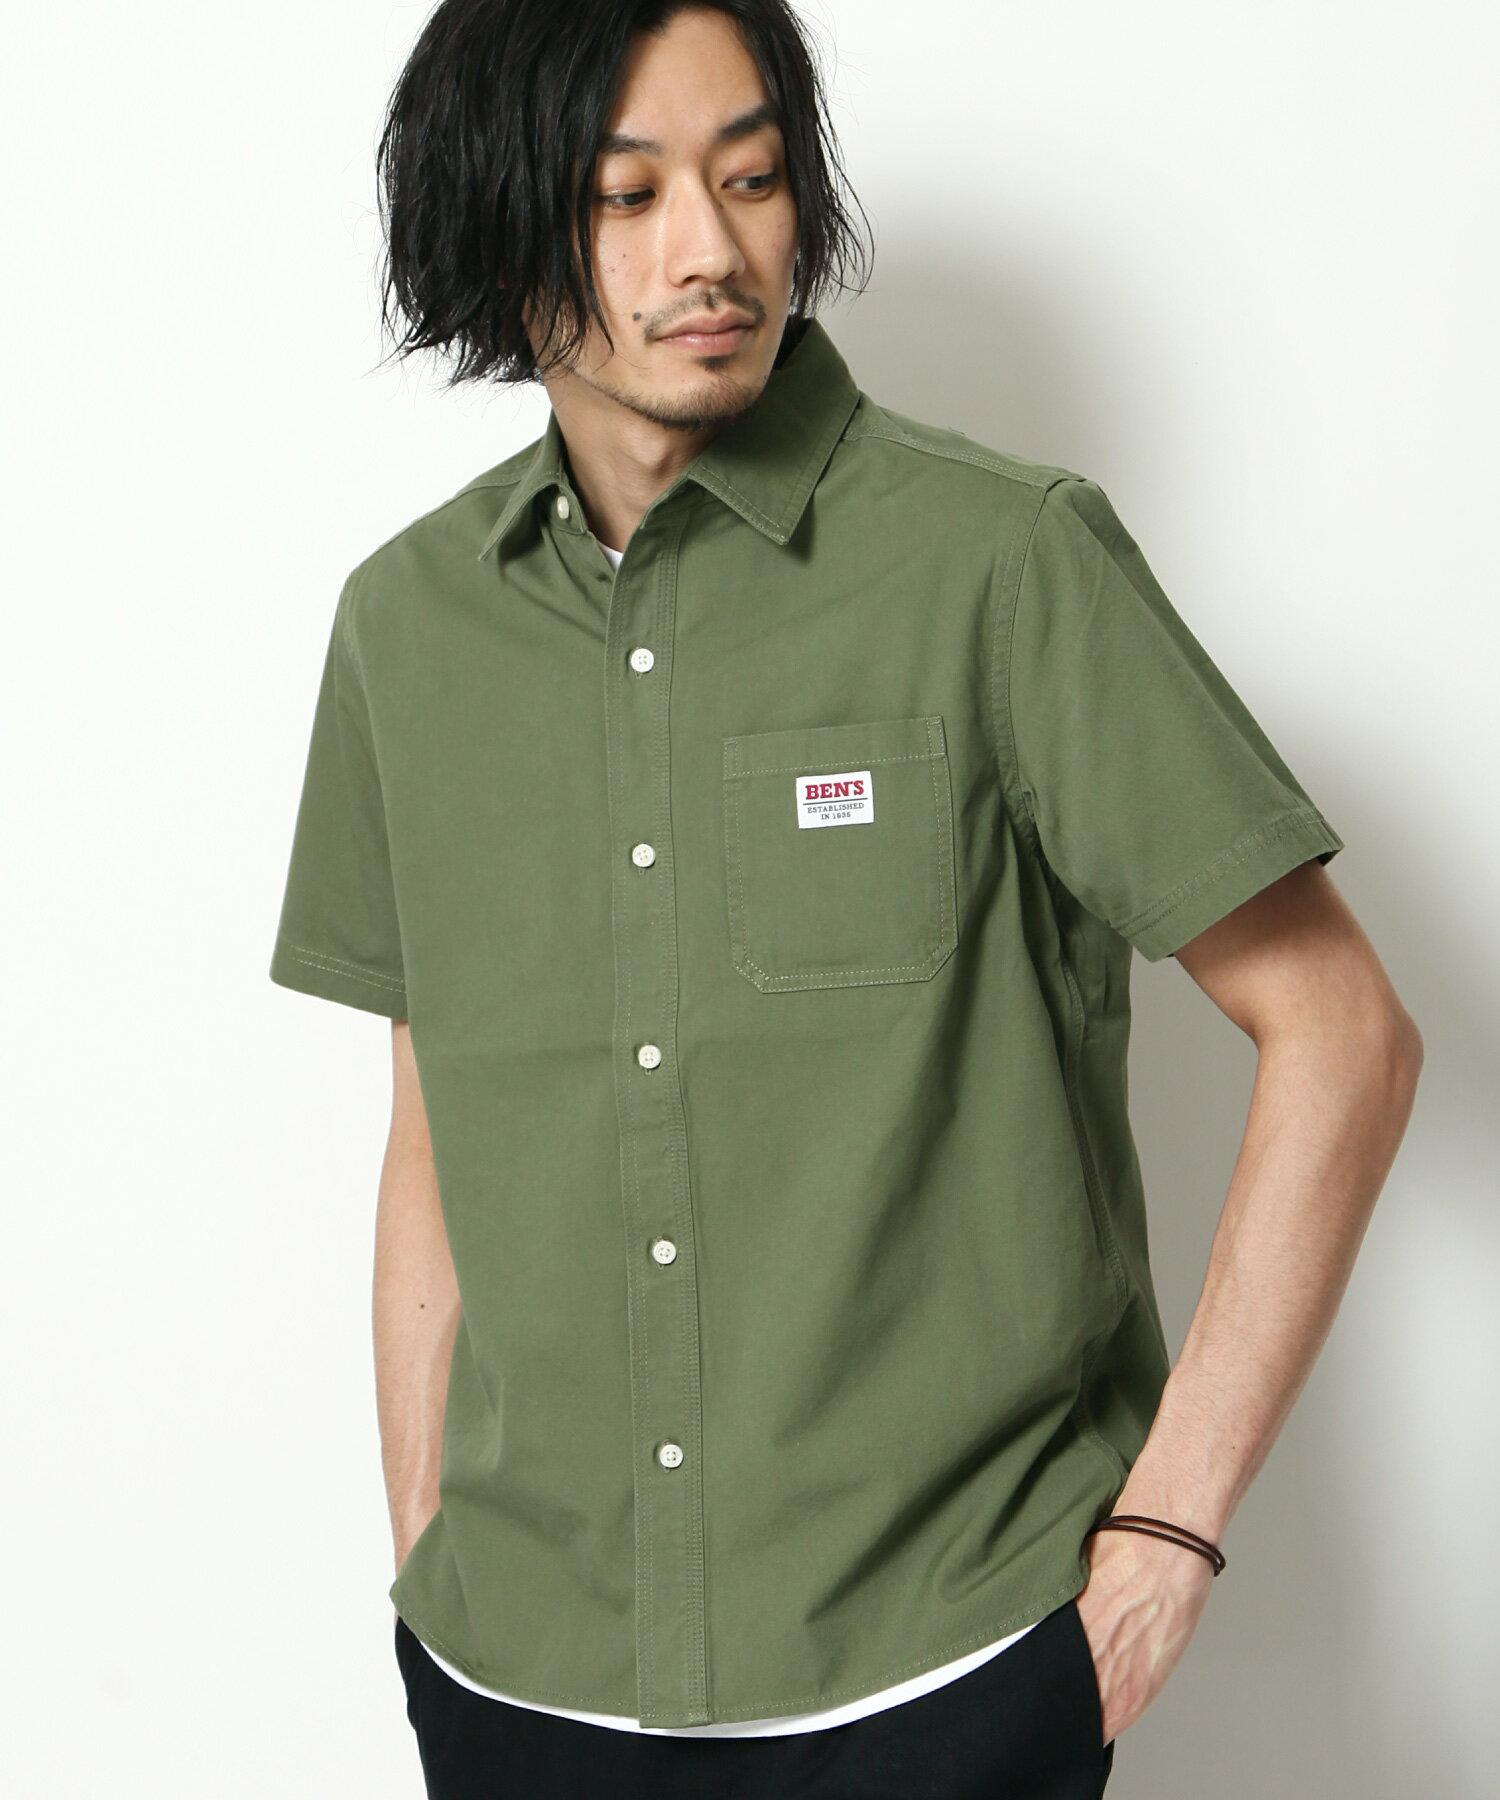 【BEN DAVIS】LOGO名牌刺繡工裝襯衫 短袖 5